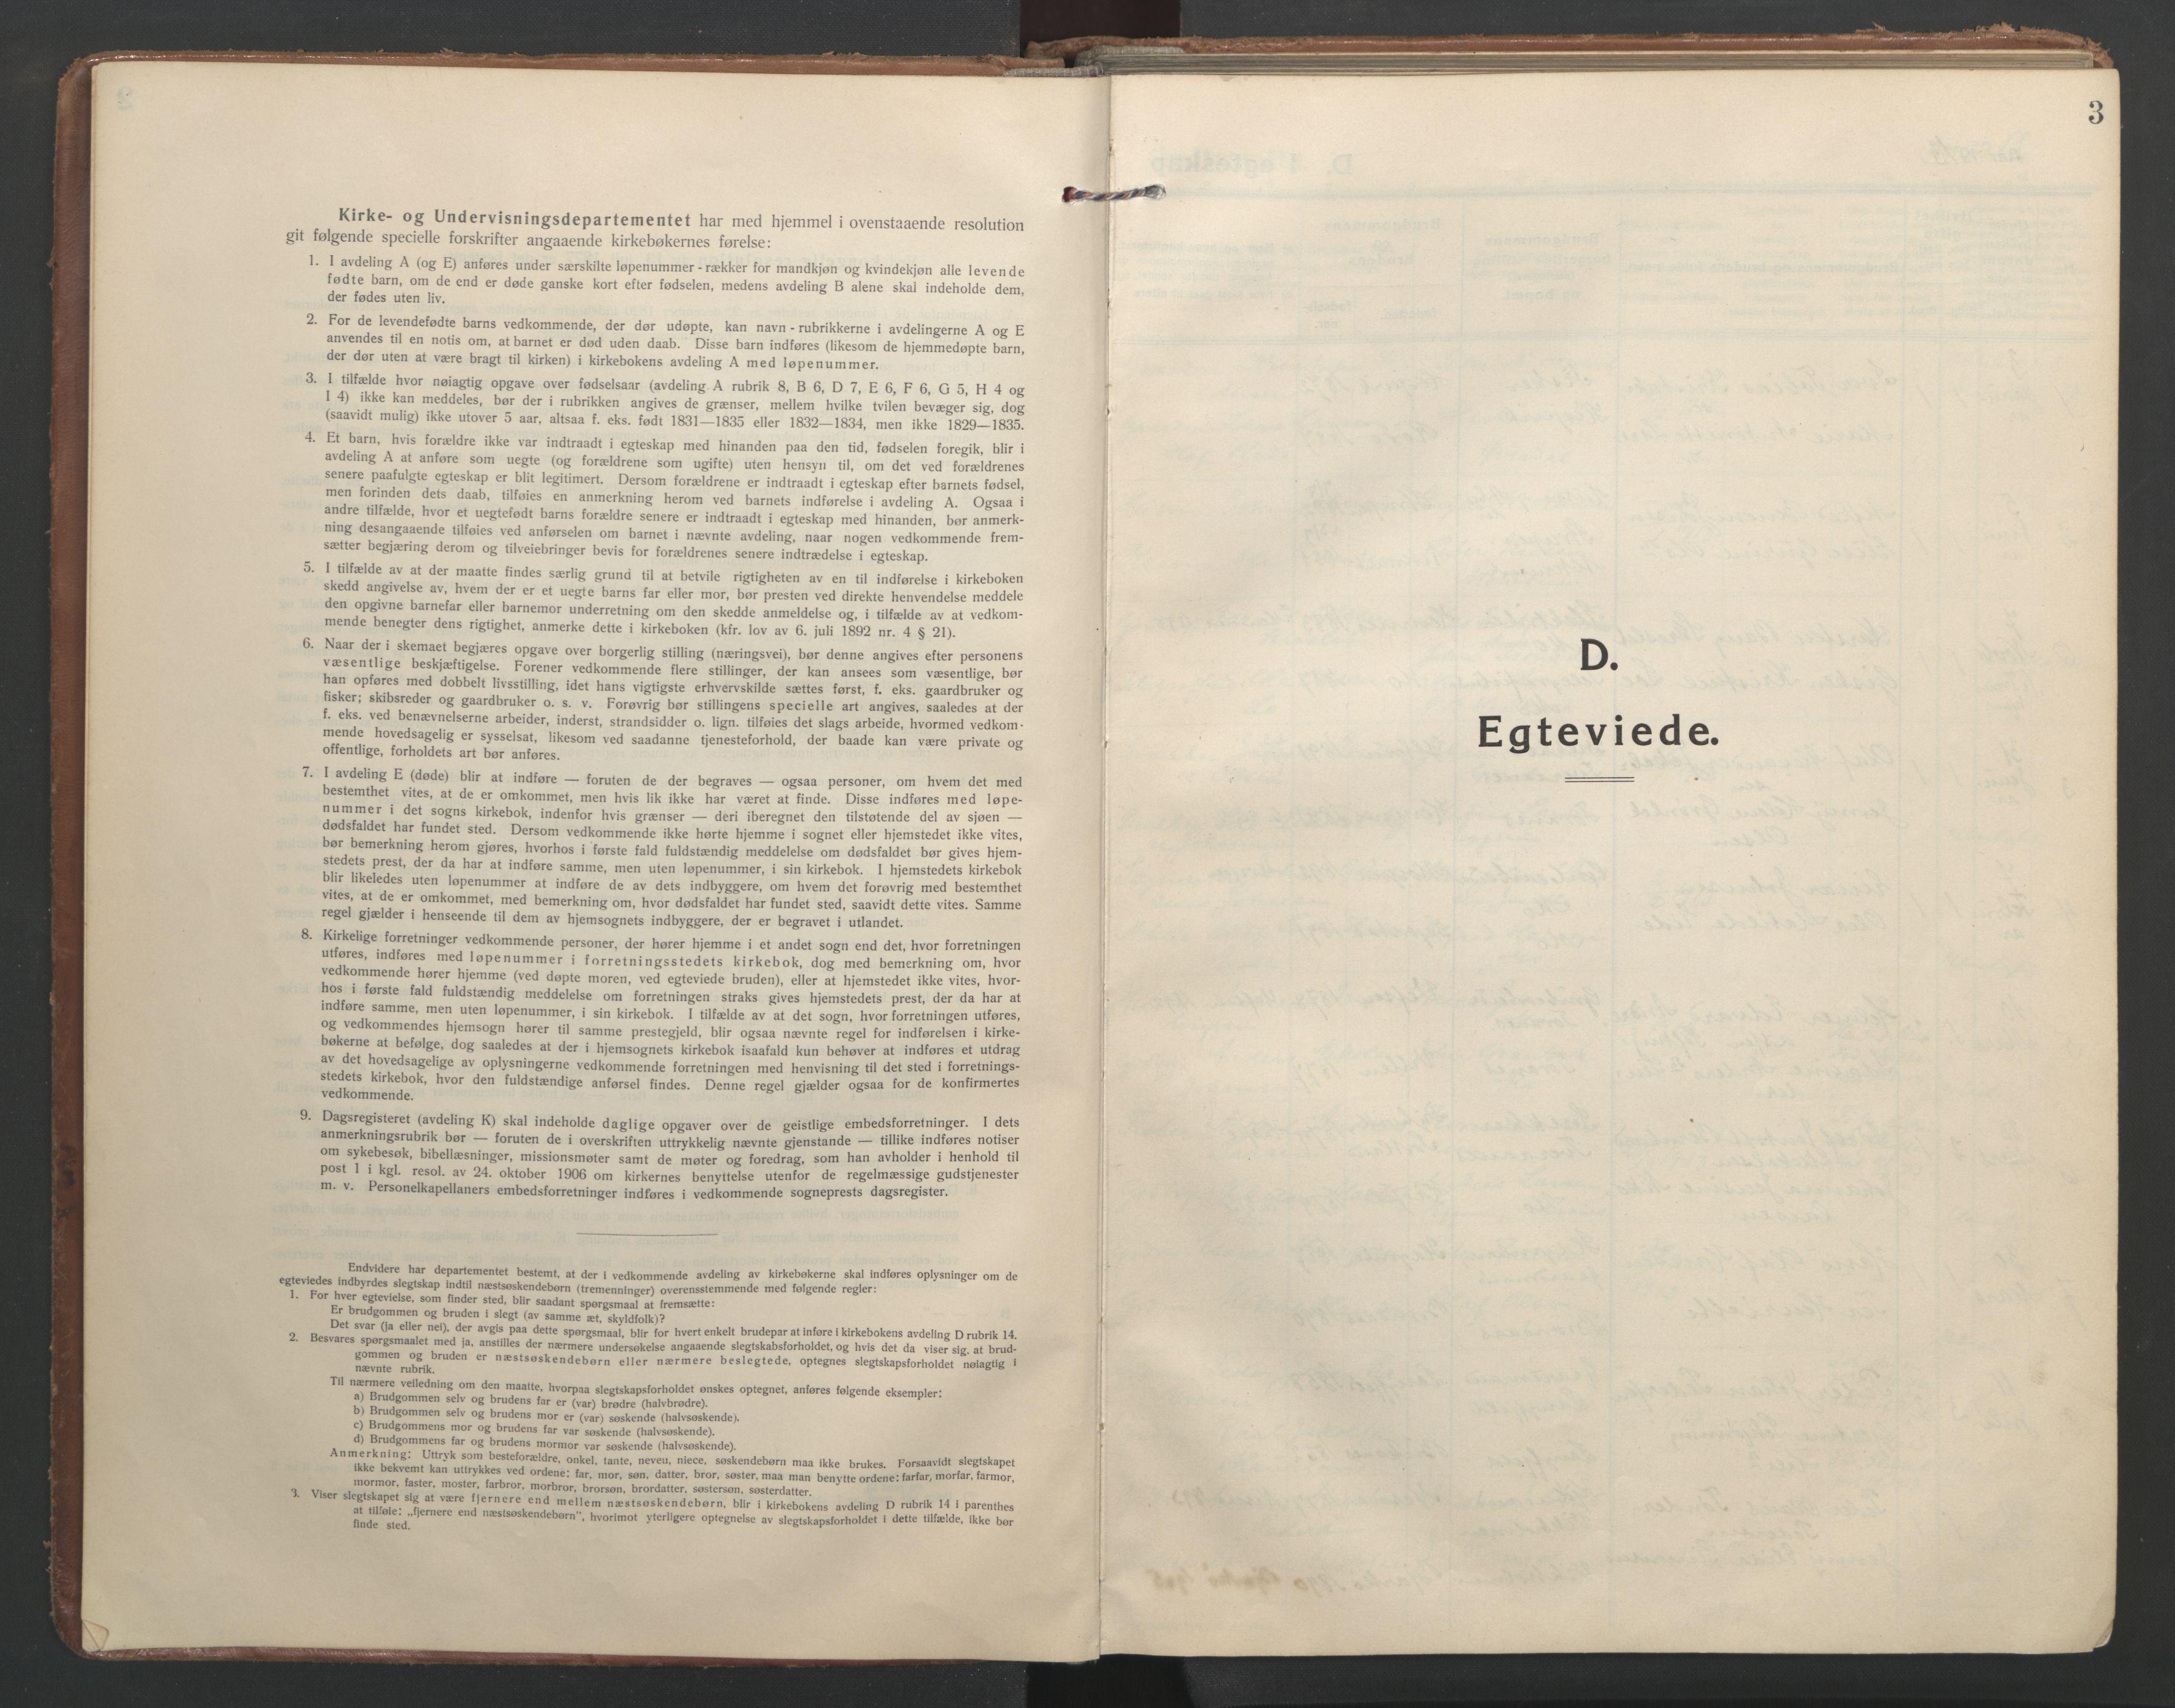 SAT, Ministerialprotokoller, klokkerbøker og fødselsregistre - Nordland, 827/L0405: Ministerialbok nr. 827A17, 1912-1925, s. 3